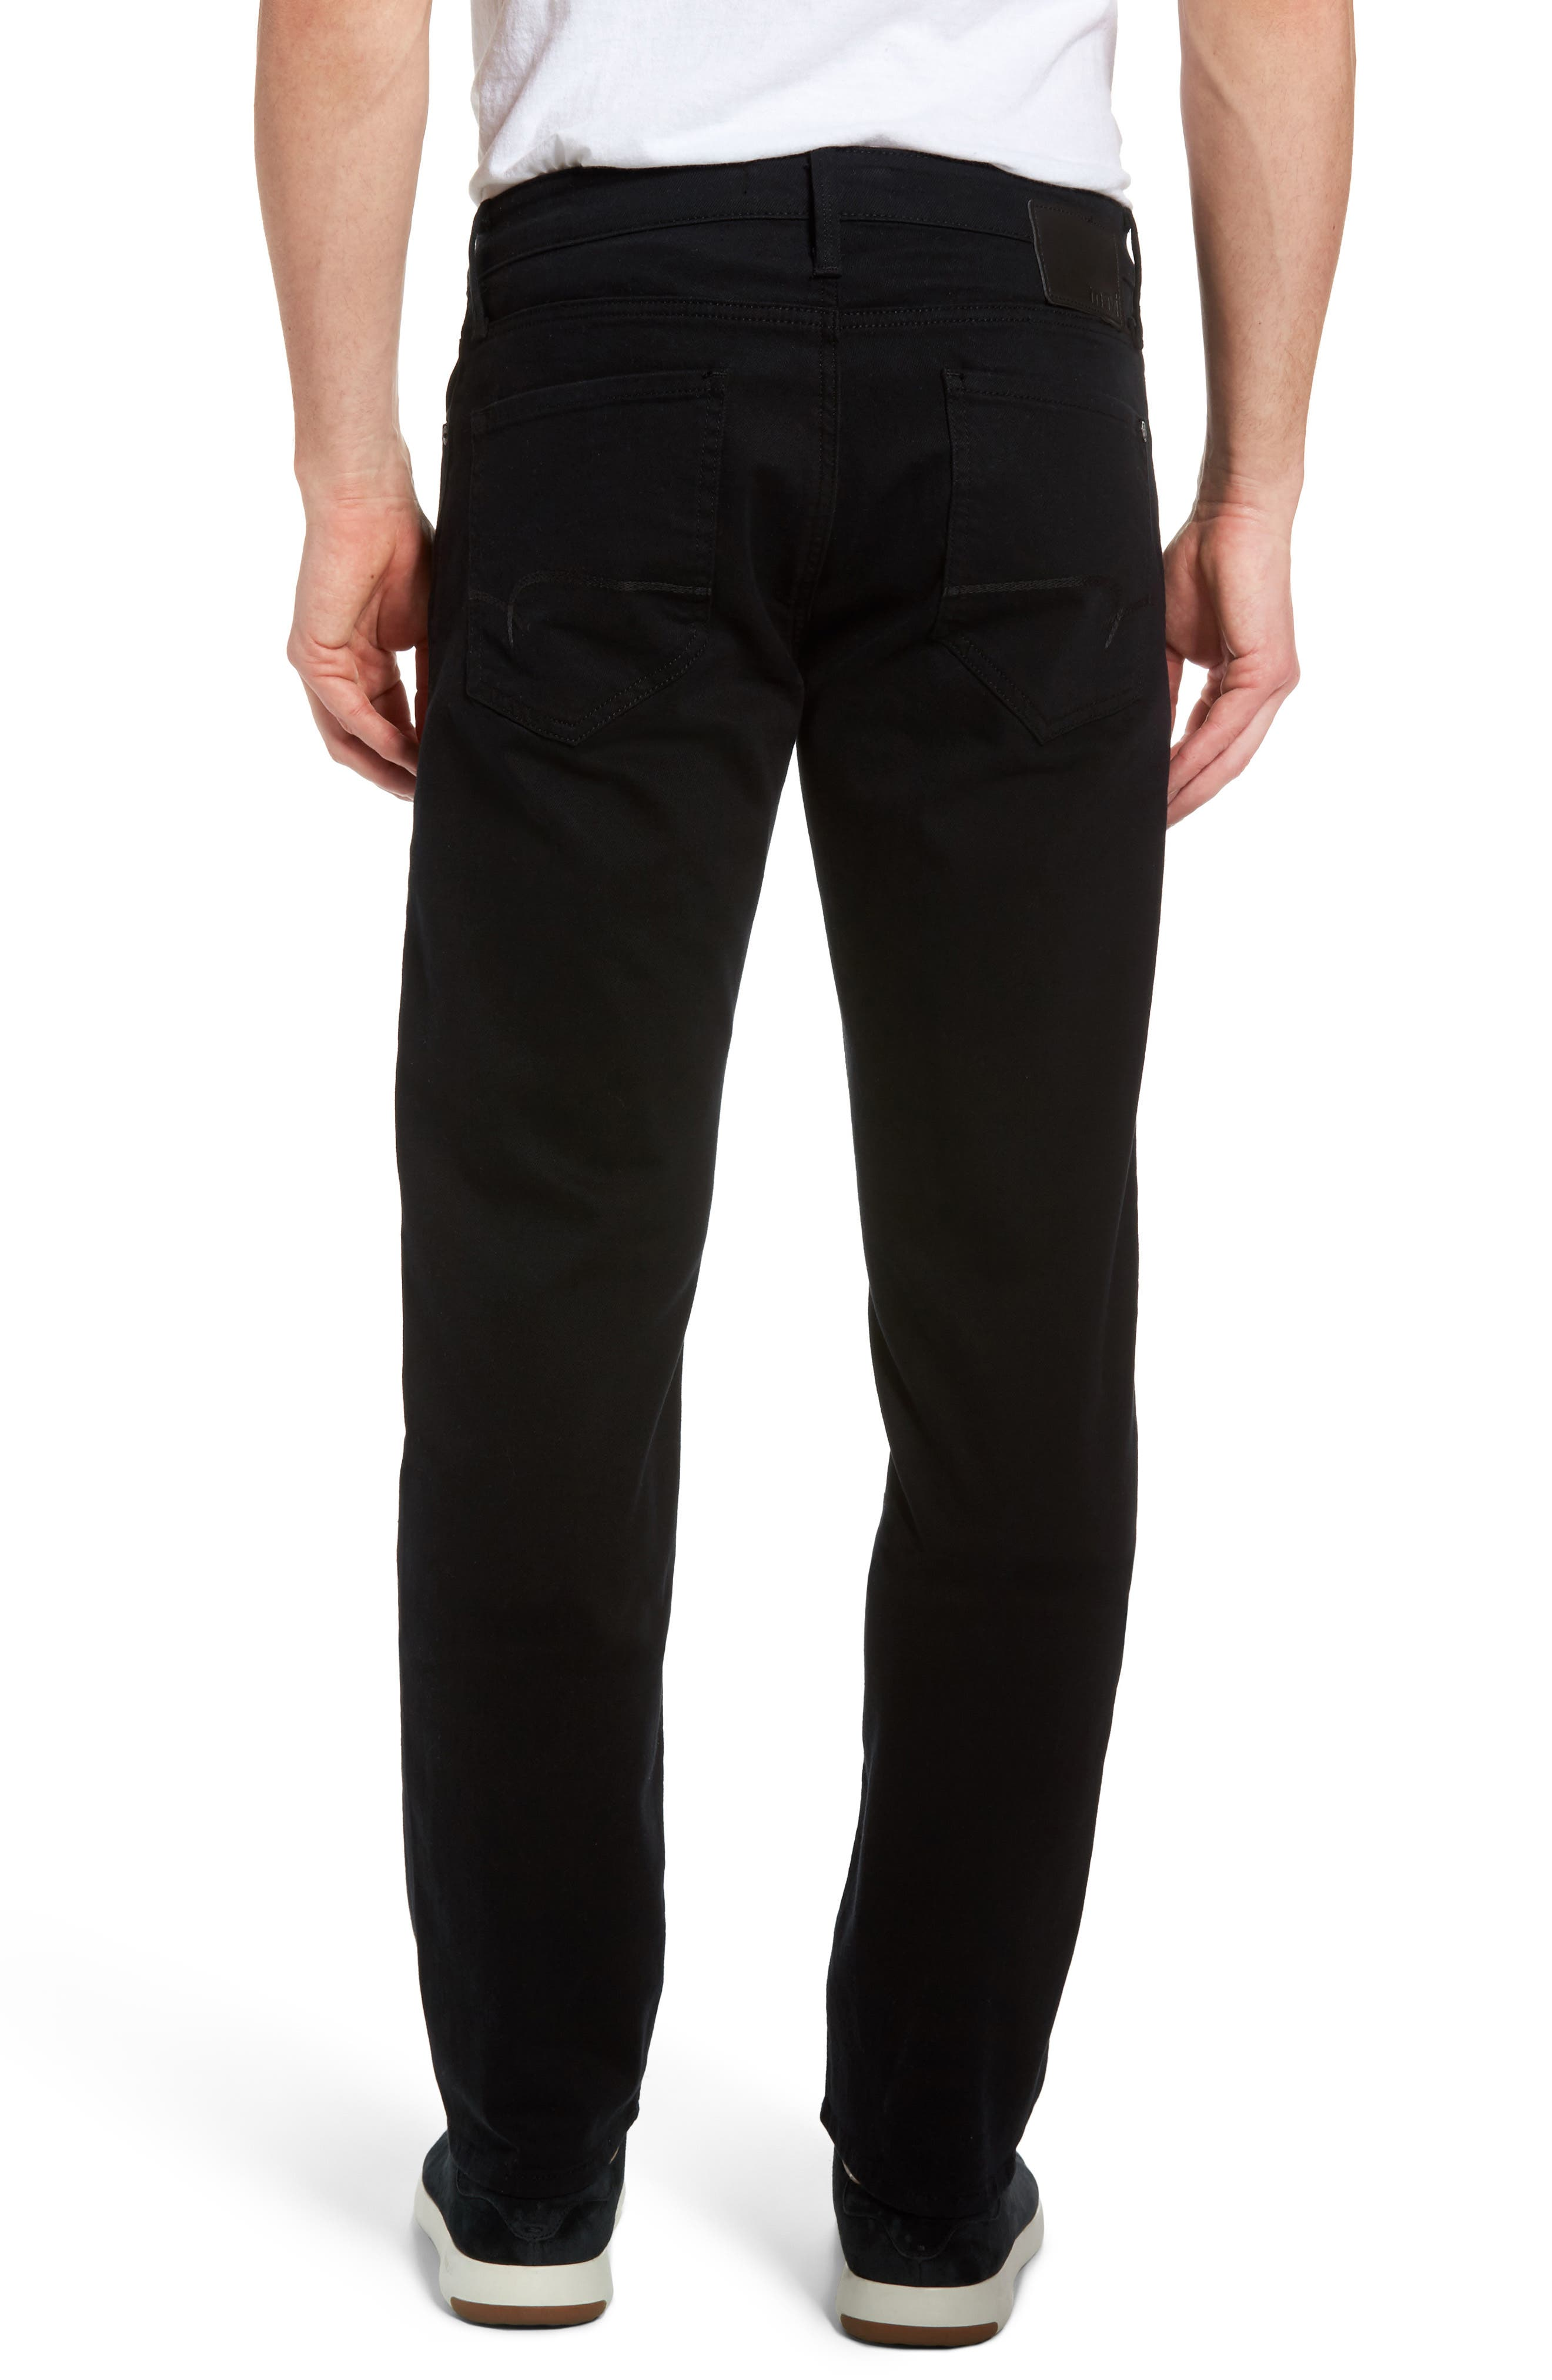 Zach Straight Leg Jeans,                             Alternate thumbnail 2, color,                             BLACK WILLIAMSBURG